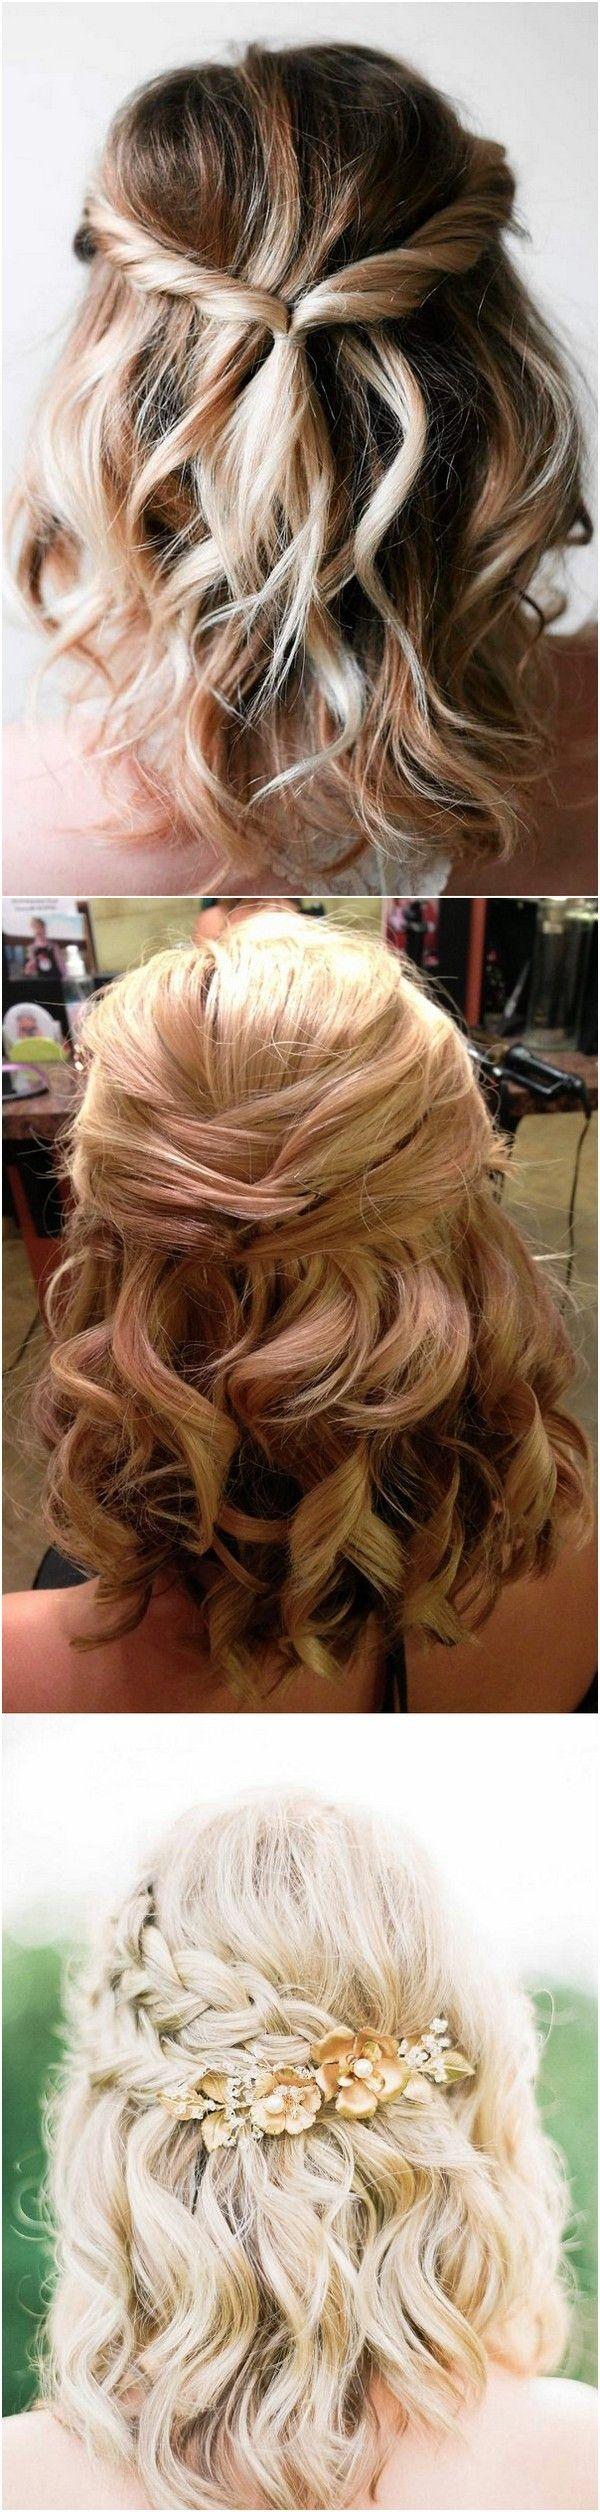 latest wedding hairstyles for medium length hair wedding stuff